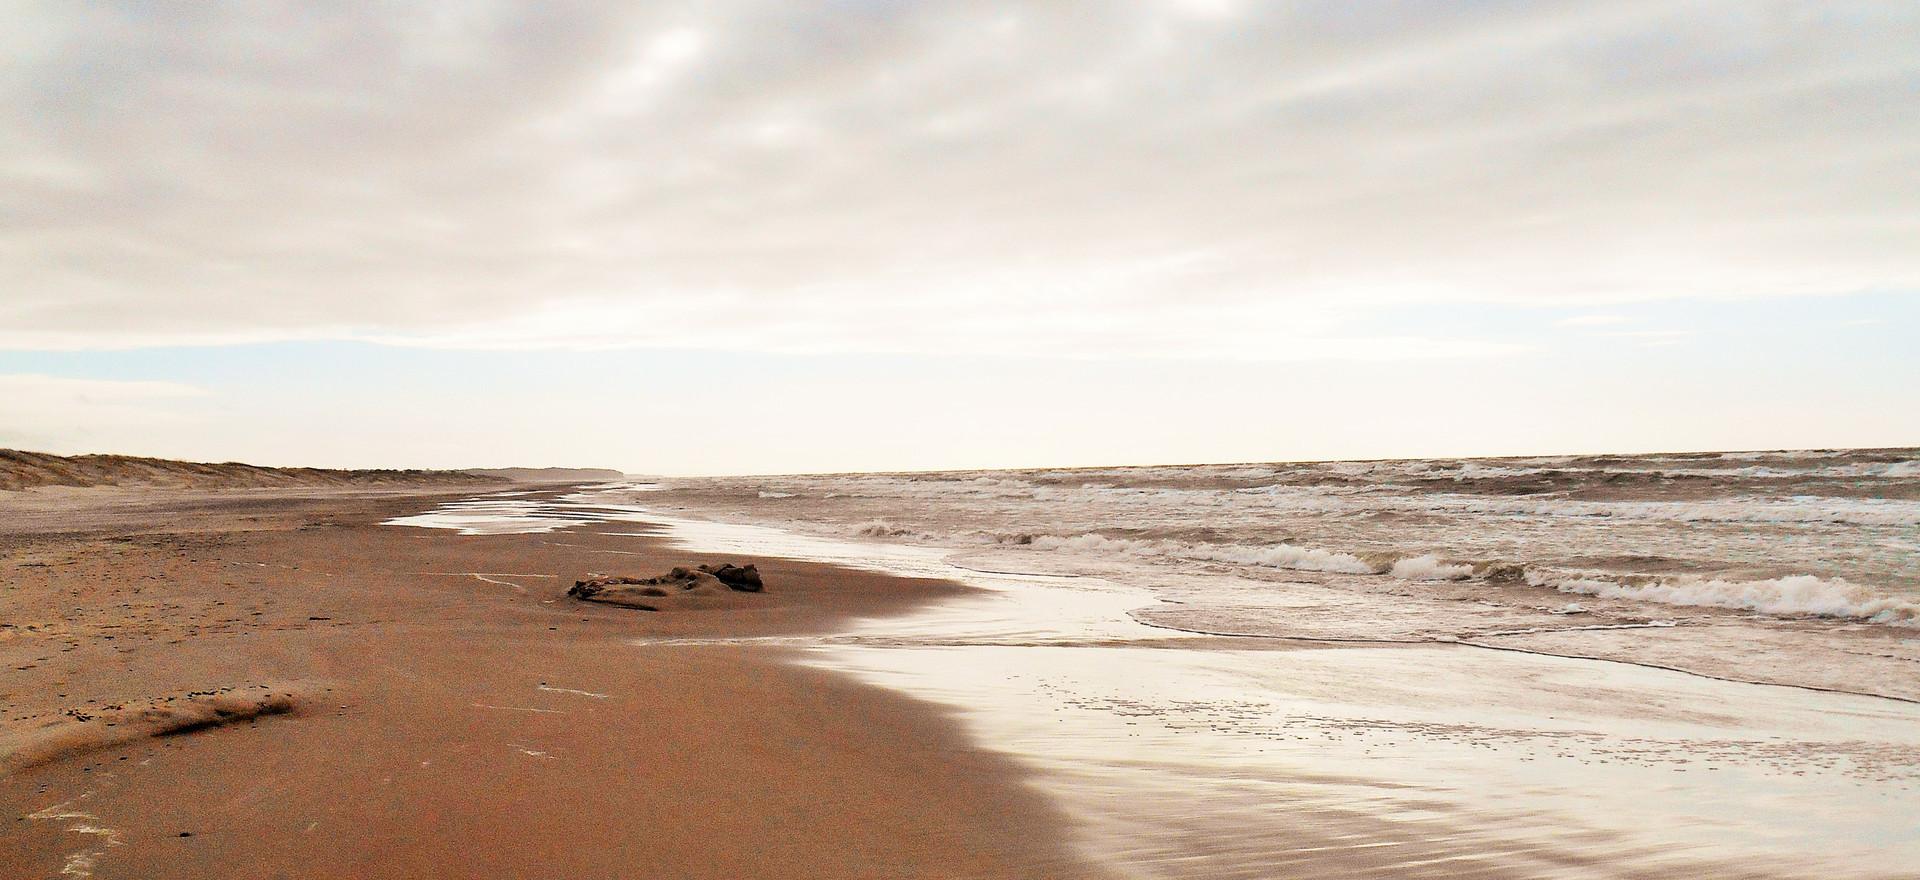 Salt praying coast, Ventspils, March 2017